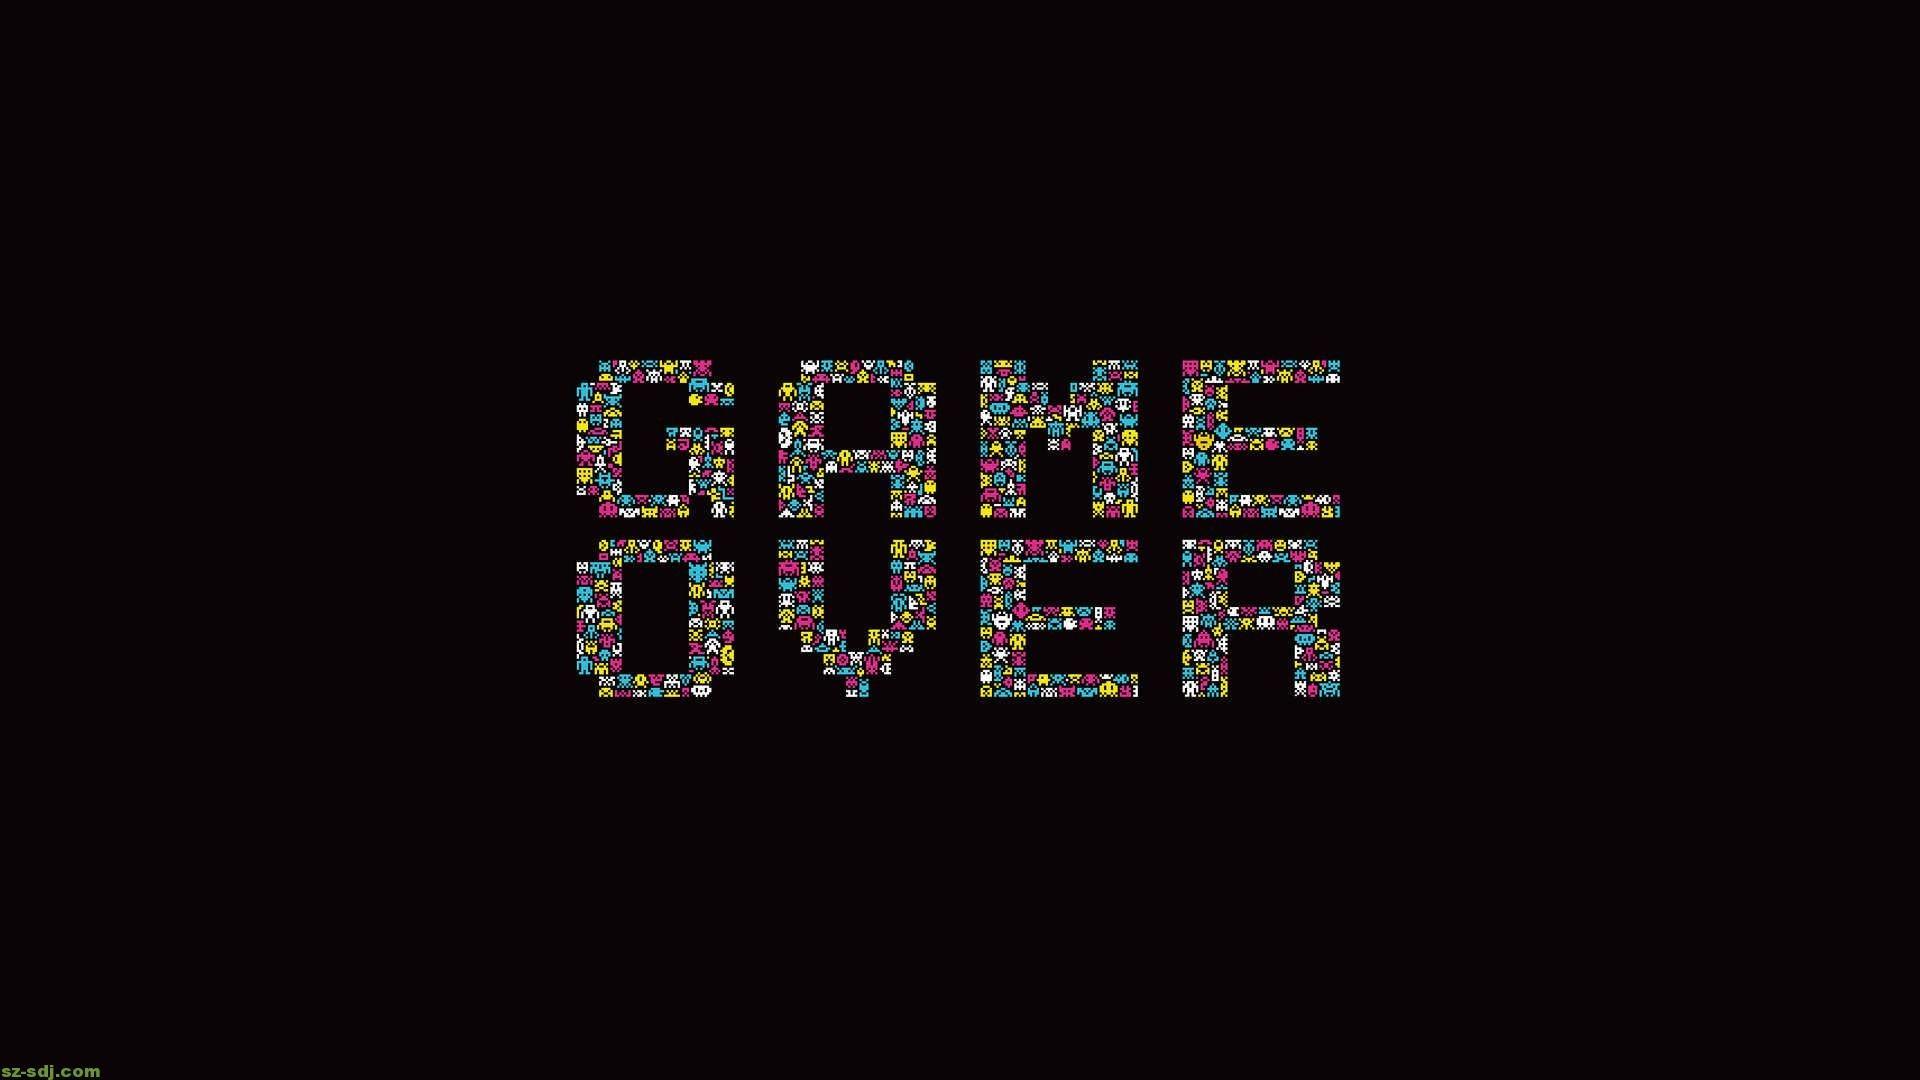 Res: 1920x1080, Best gamer Wallpaper 2048X1152 Video Games - Bing Images | GAMER |  Pinterest | Video games, Wallpaper and Gaming